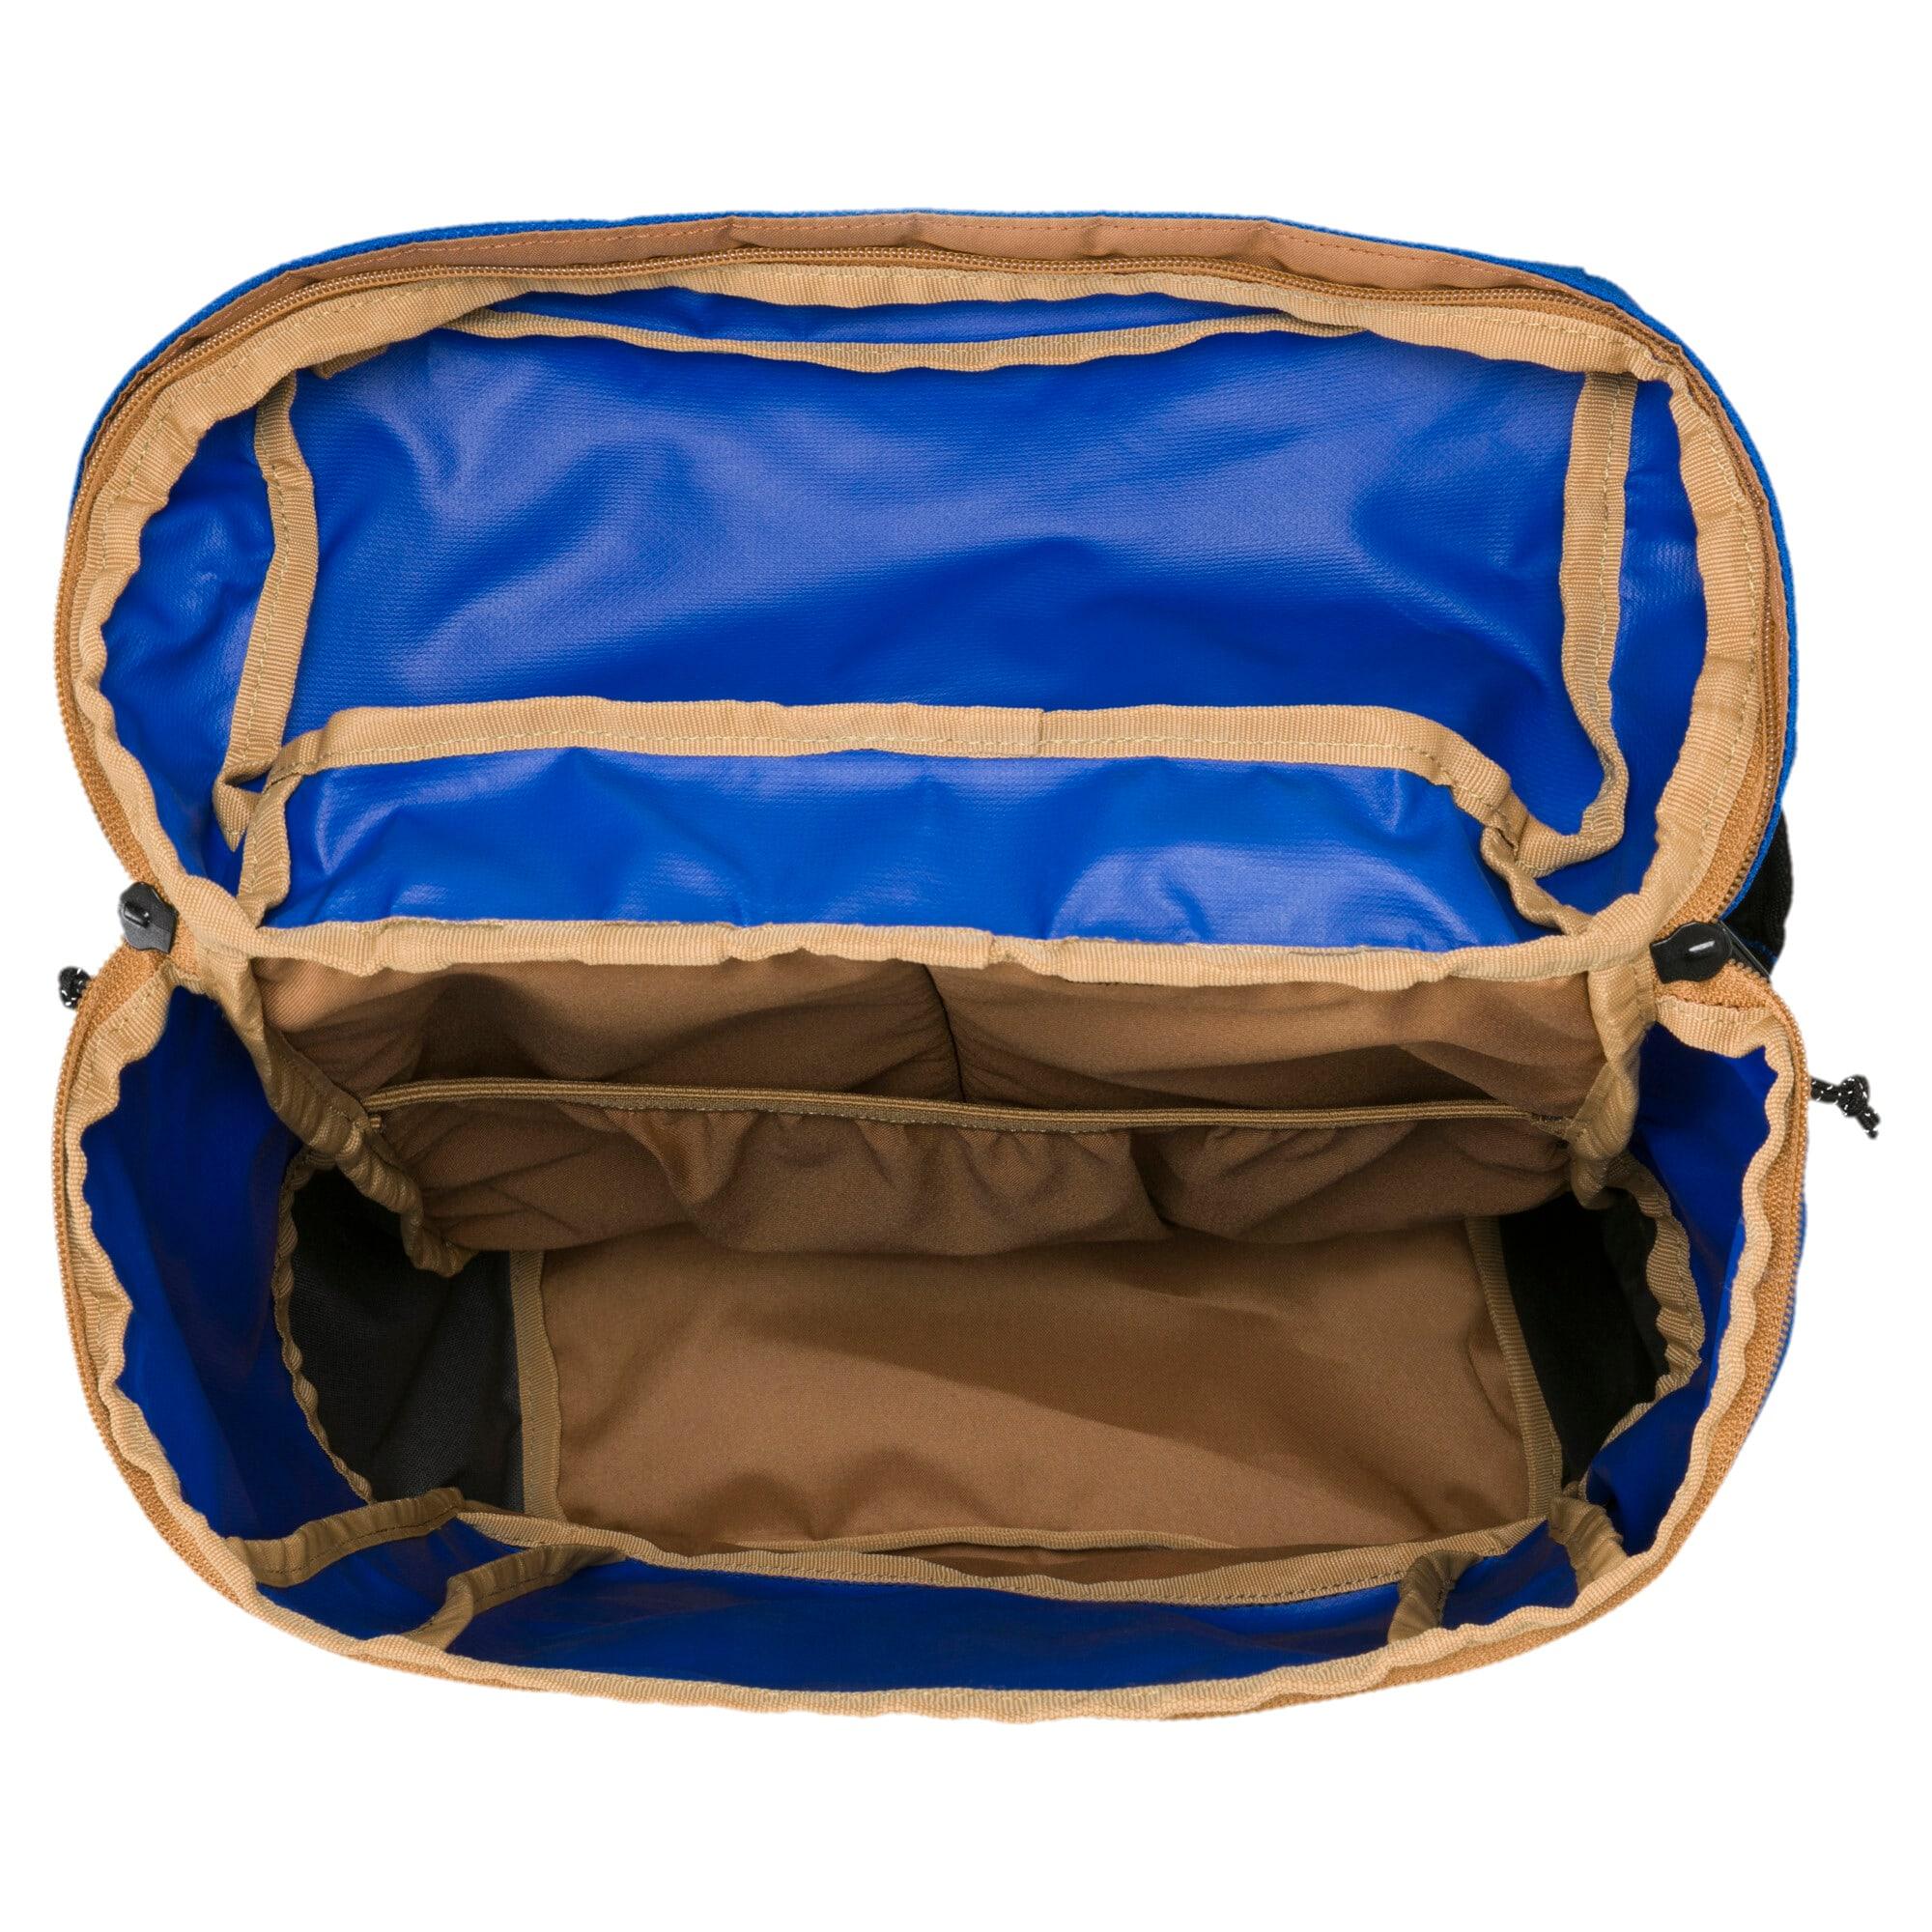 Thumbnail 3 of Sole Backpack Plus, Lapis Blue-Puma White, medium-IND